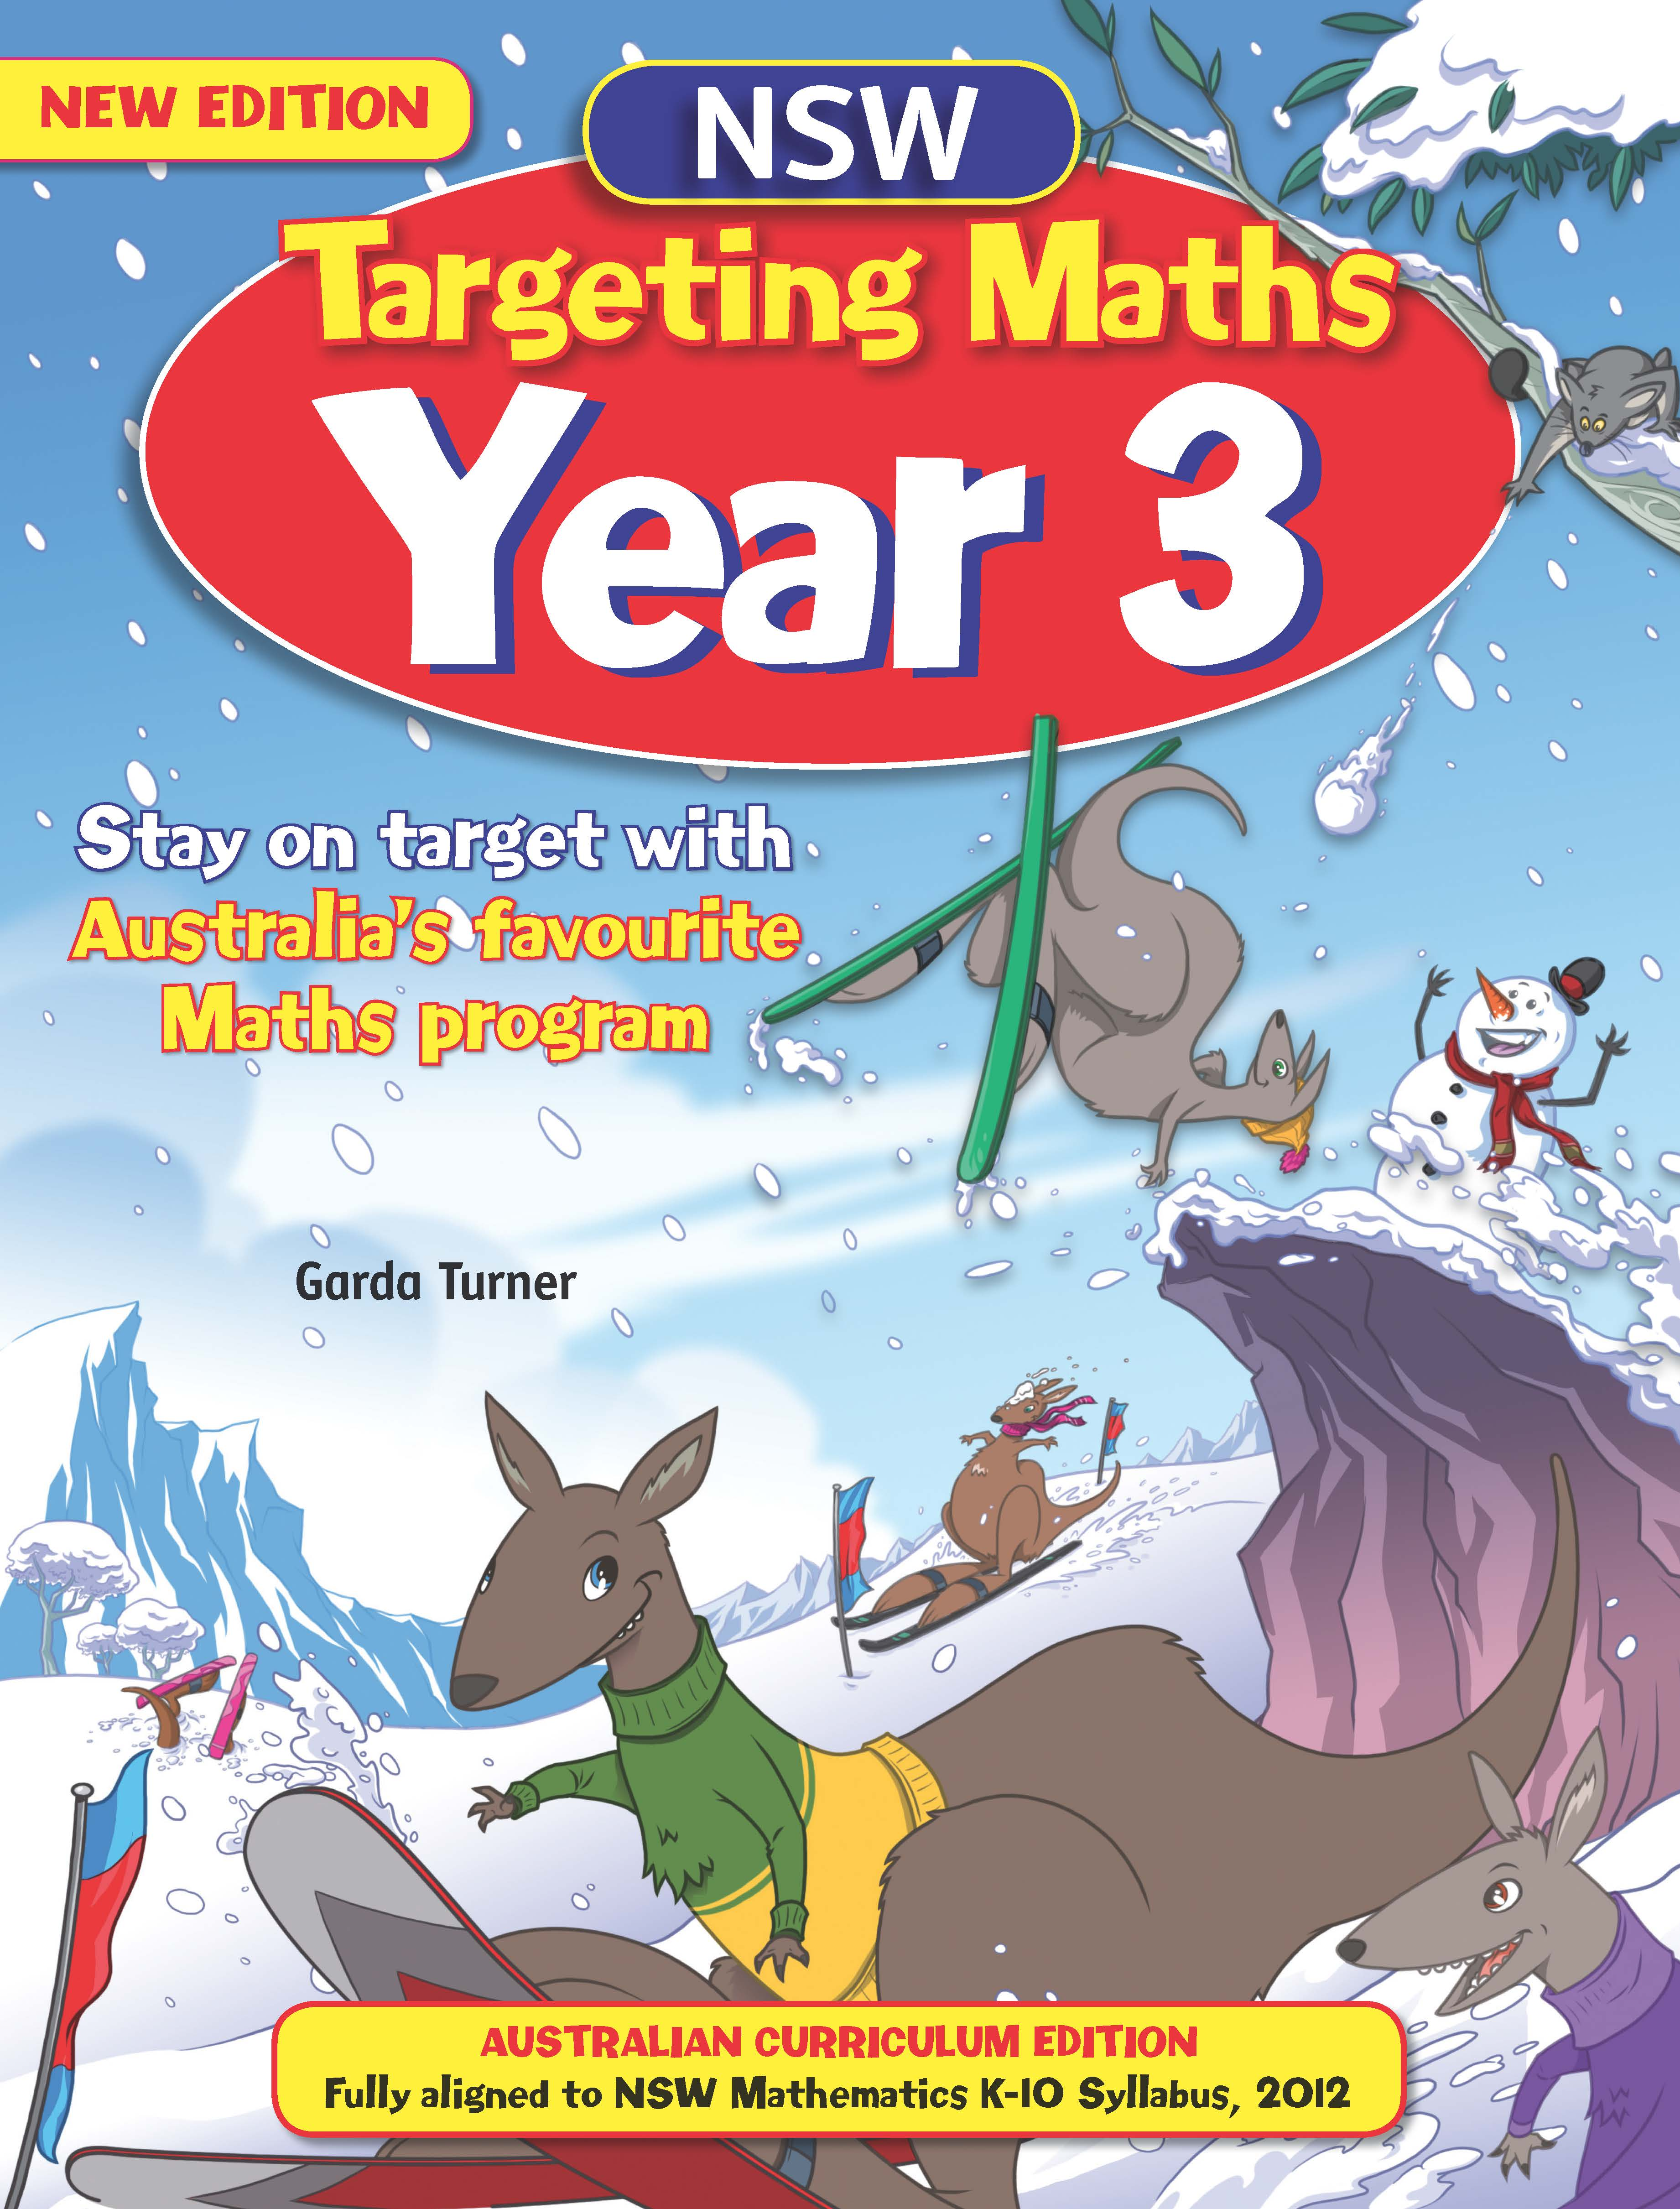 NSW Targeting Maths Australian Curriculum Edition Student Book Year 3